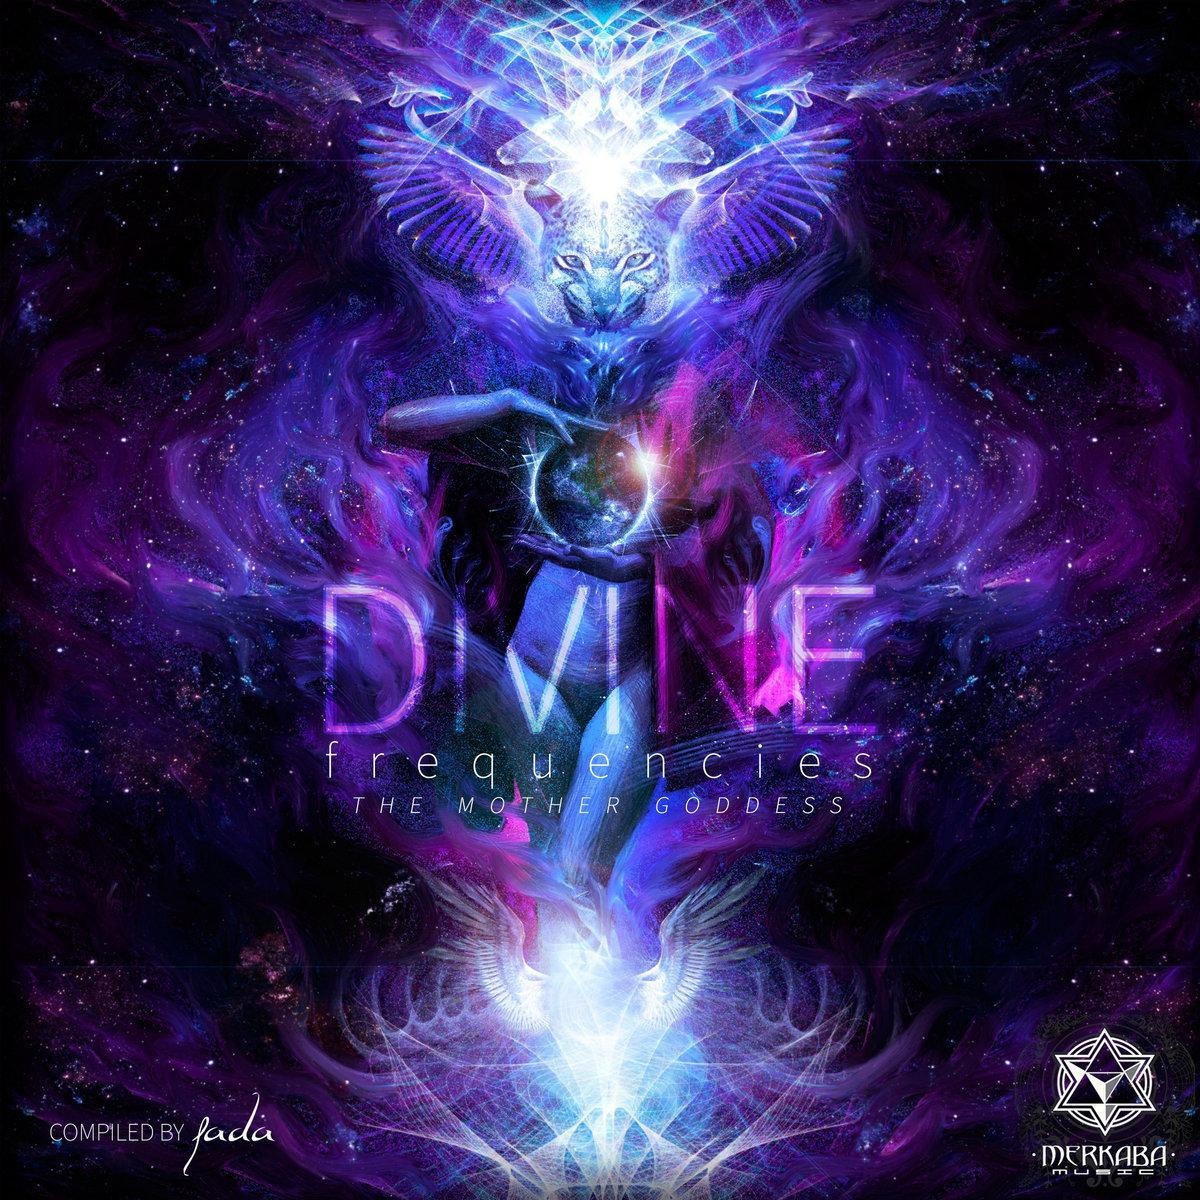 Divine Frequencies - The Mother Goddess | Merkaba Music